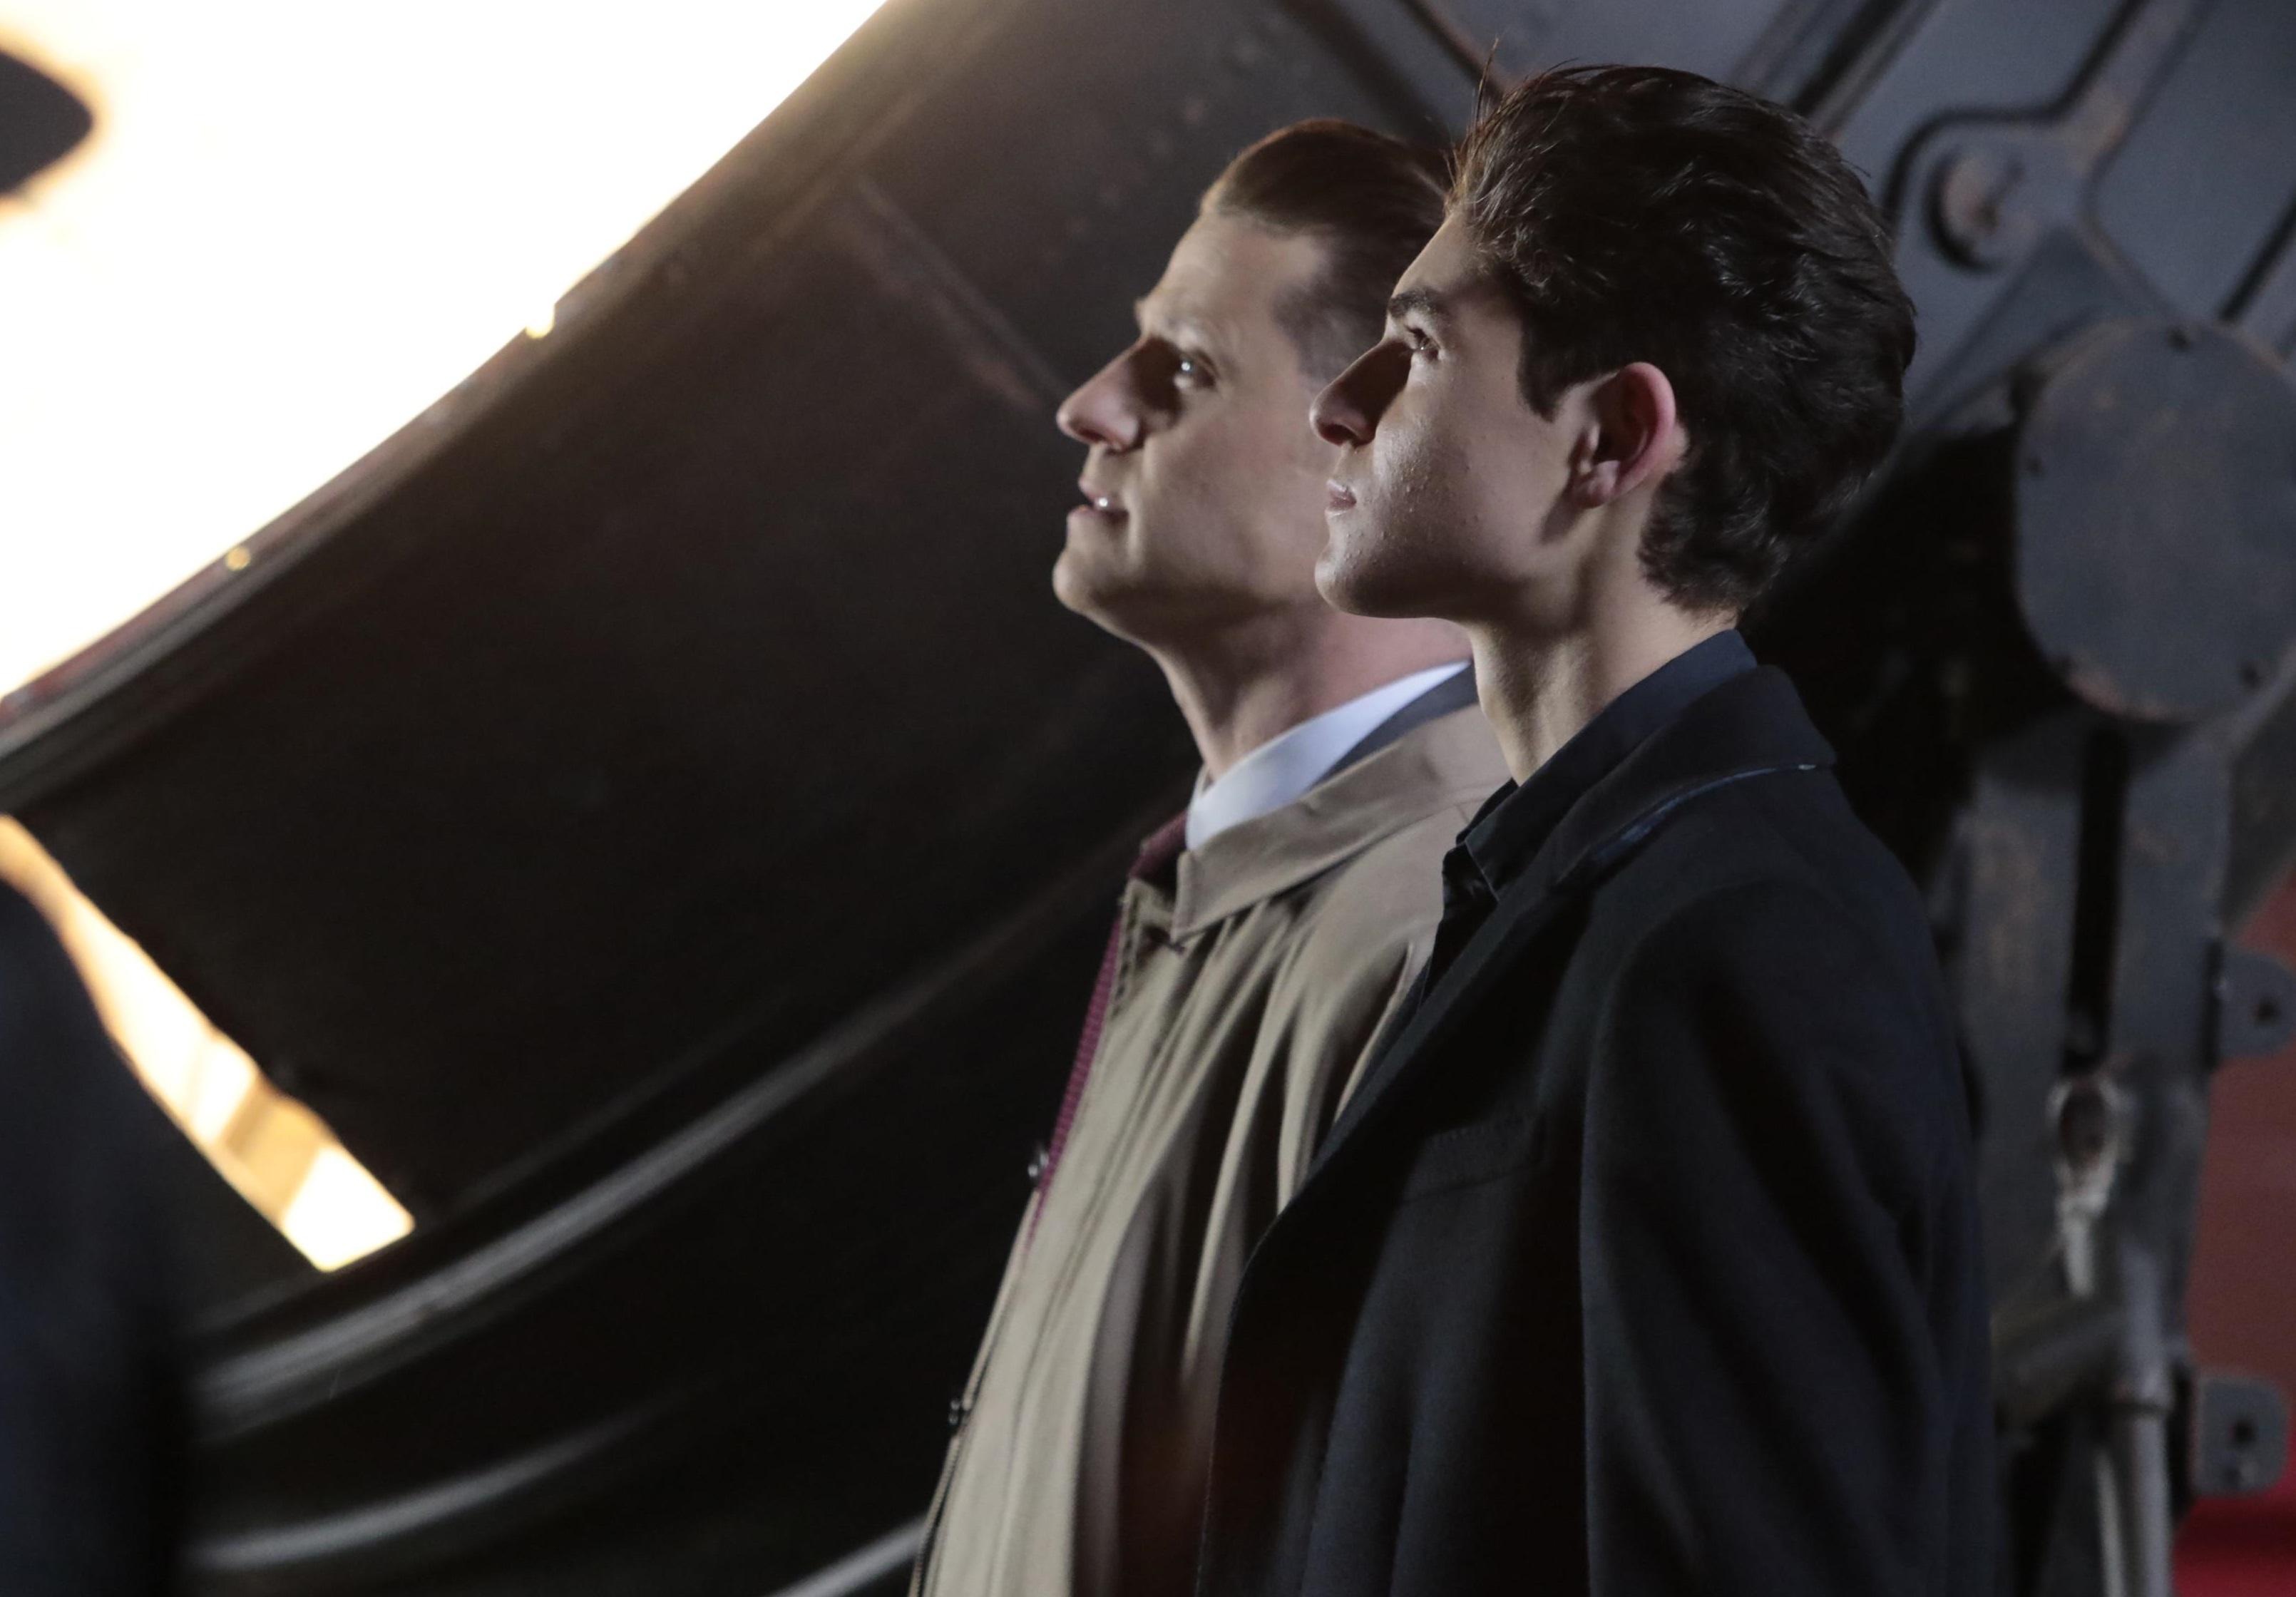 gotham season 4 episode 10 download